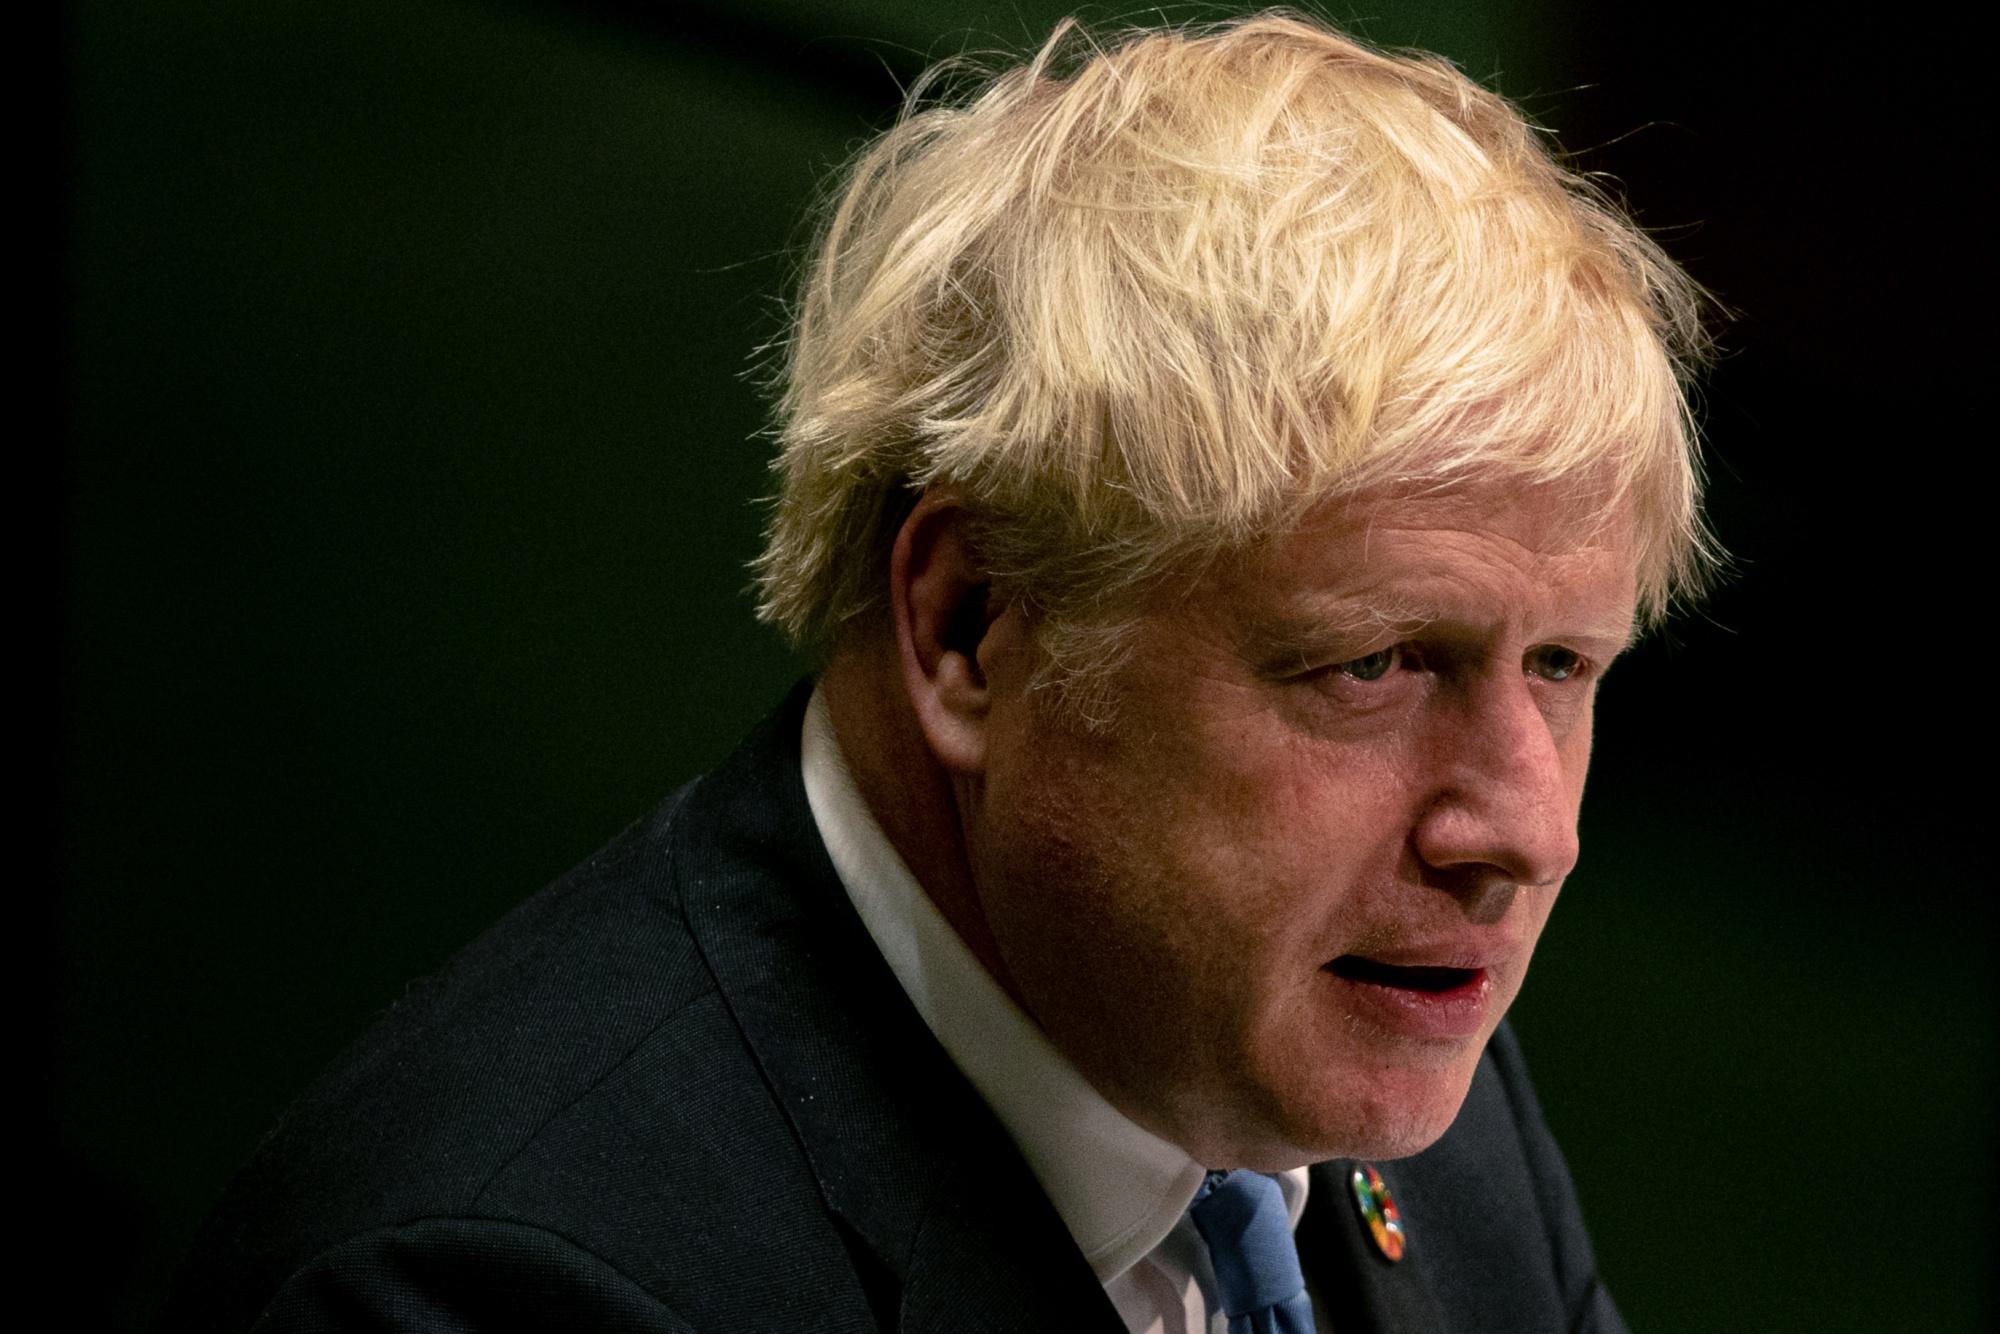 Scottish Judges Wait to Decide Whether Johnson Met Benn Act